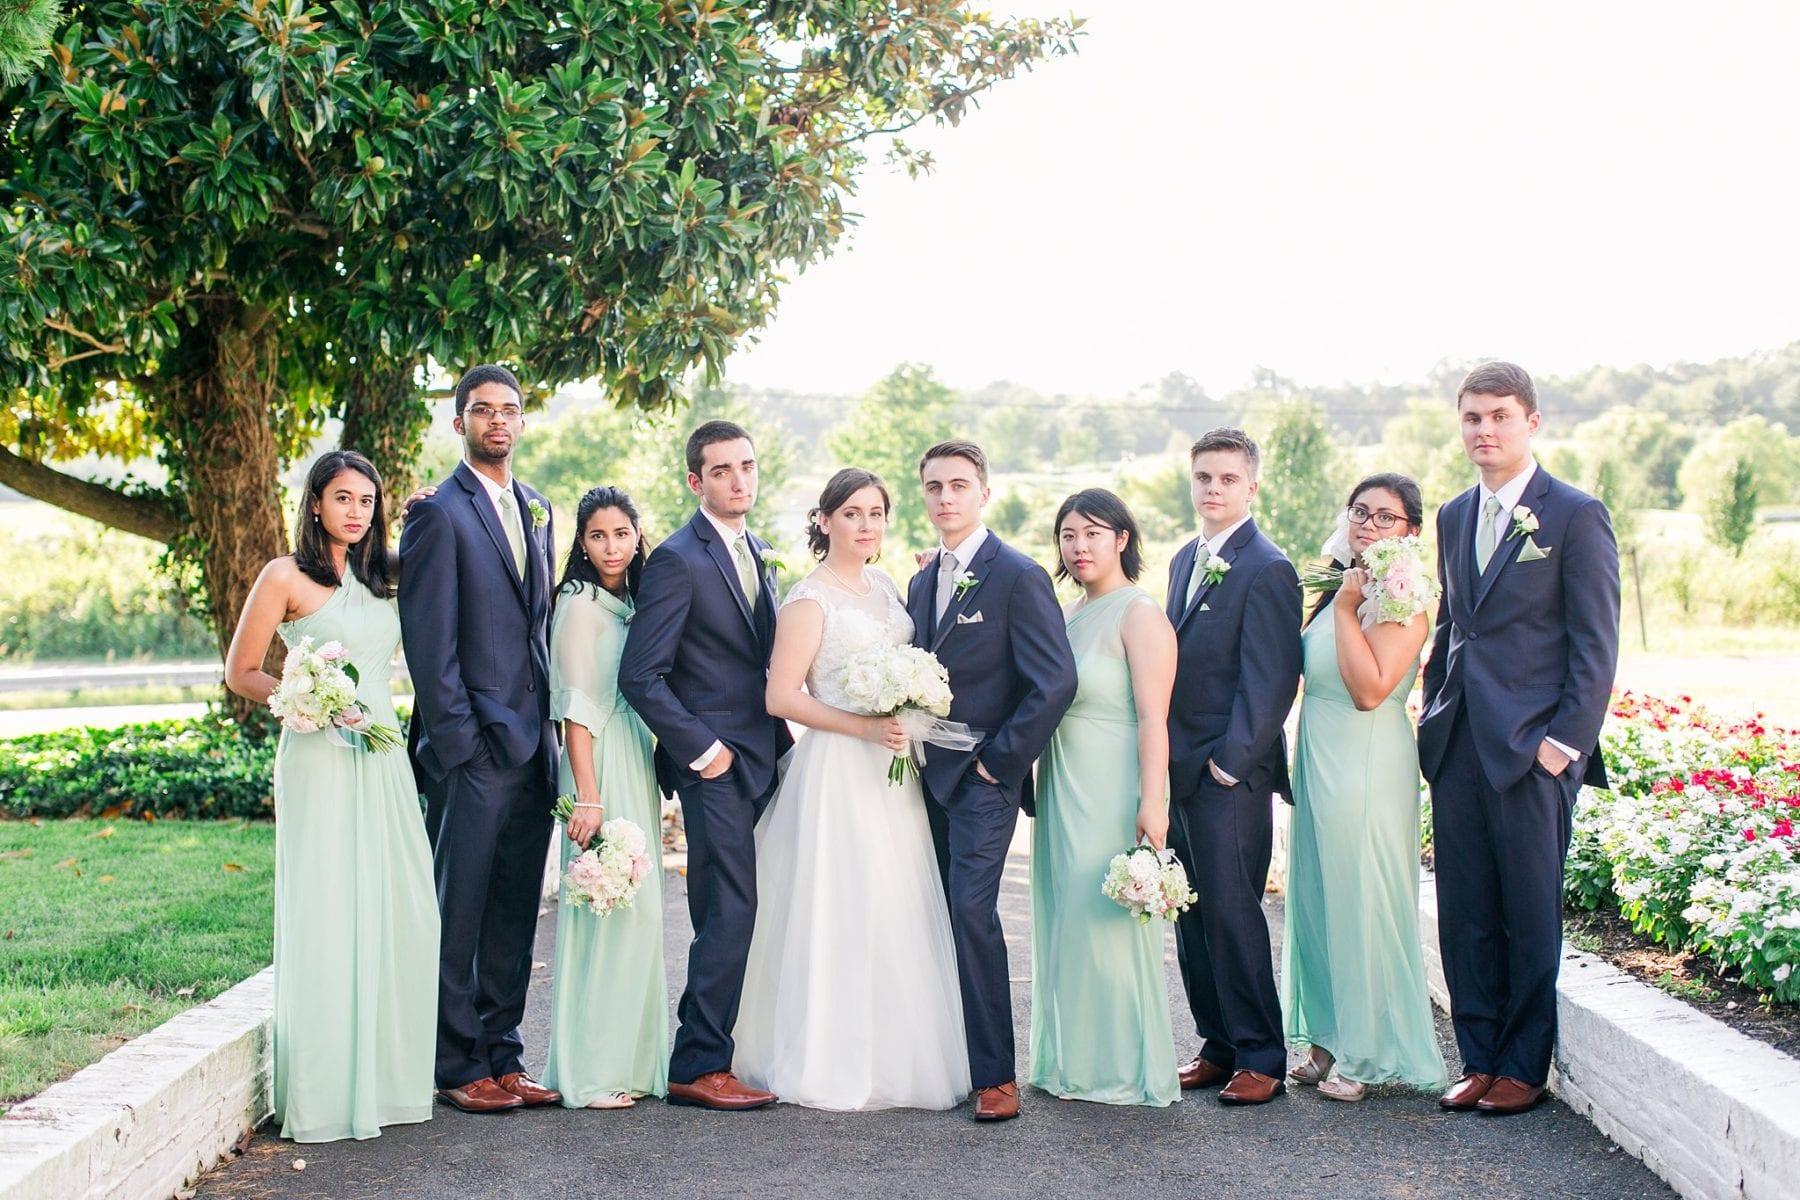 Bristow Manor Wedding Photos Virginia Wedding Photographer Lauren & Andrew Megan Kelsey Photography-443.jpg